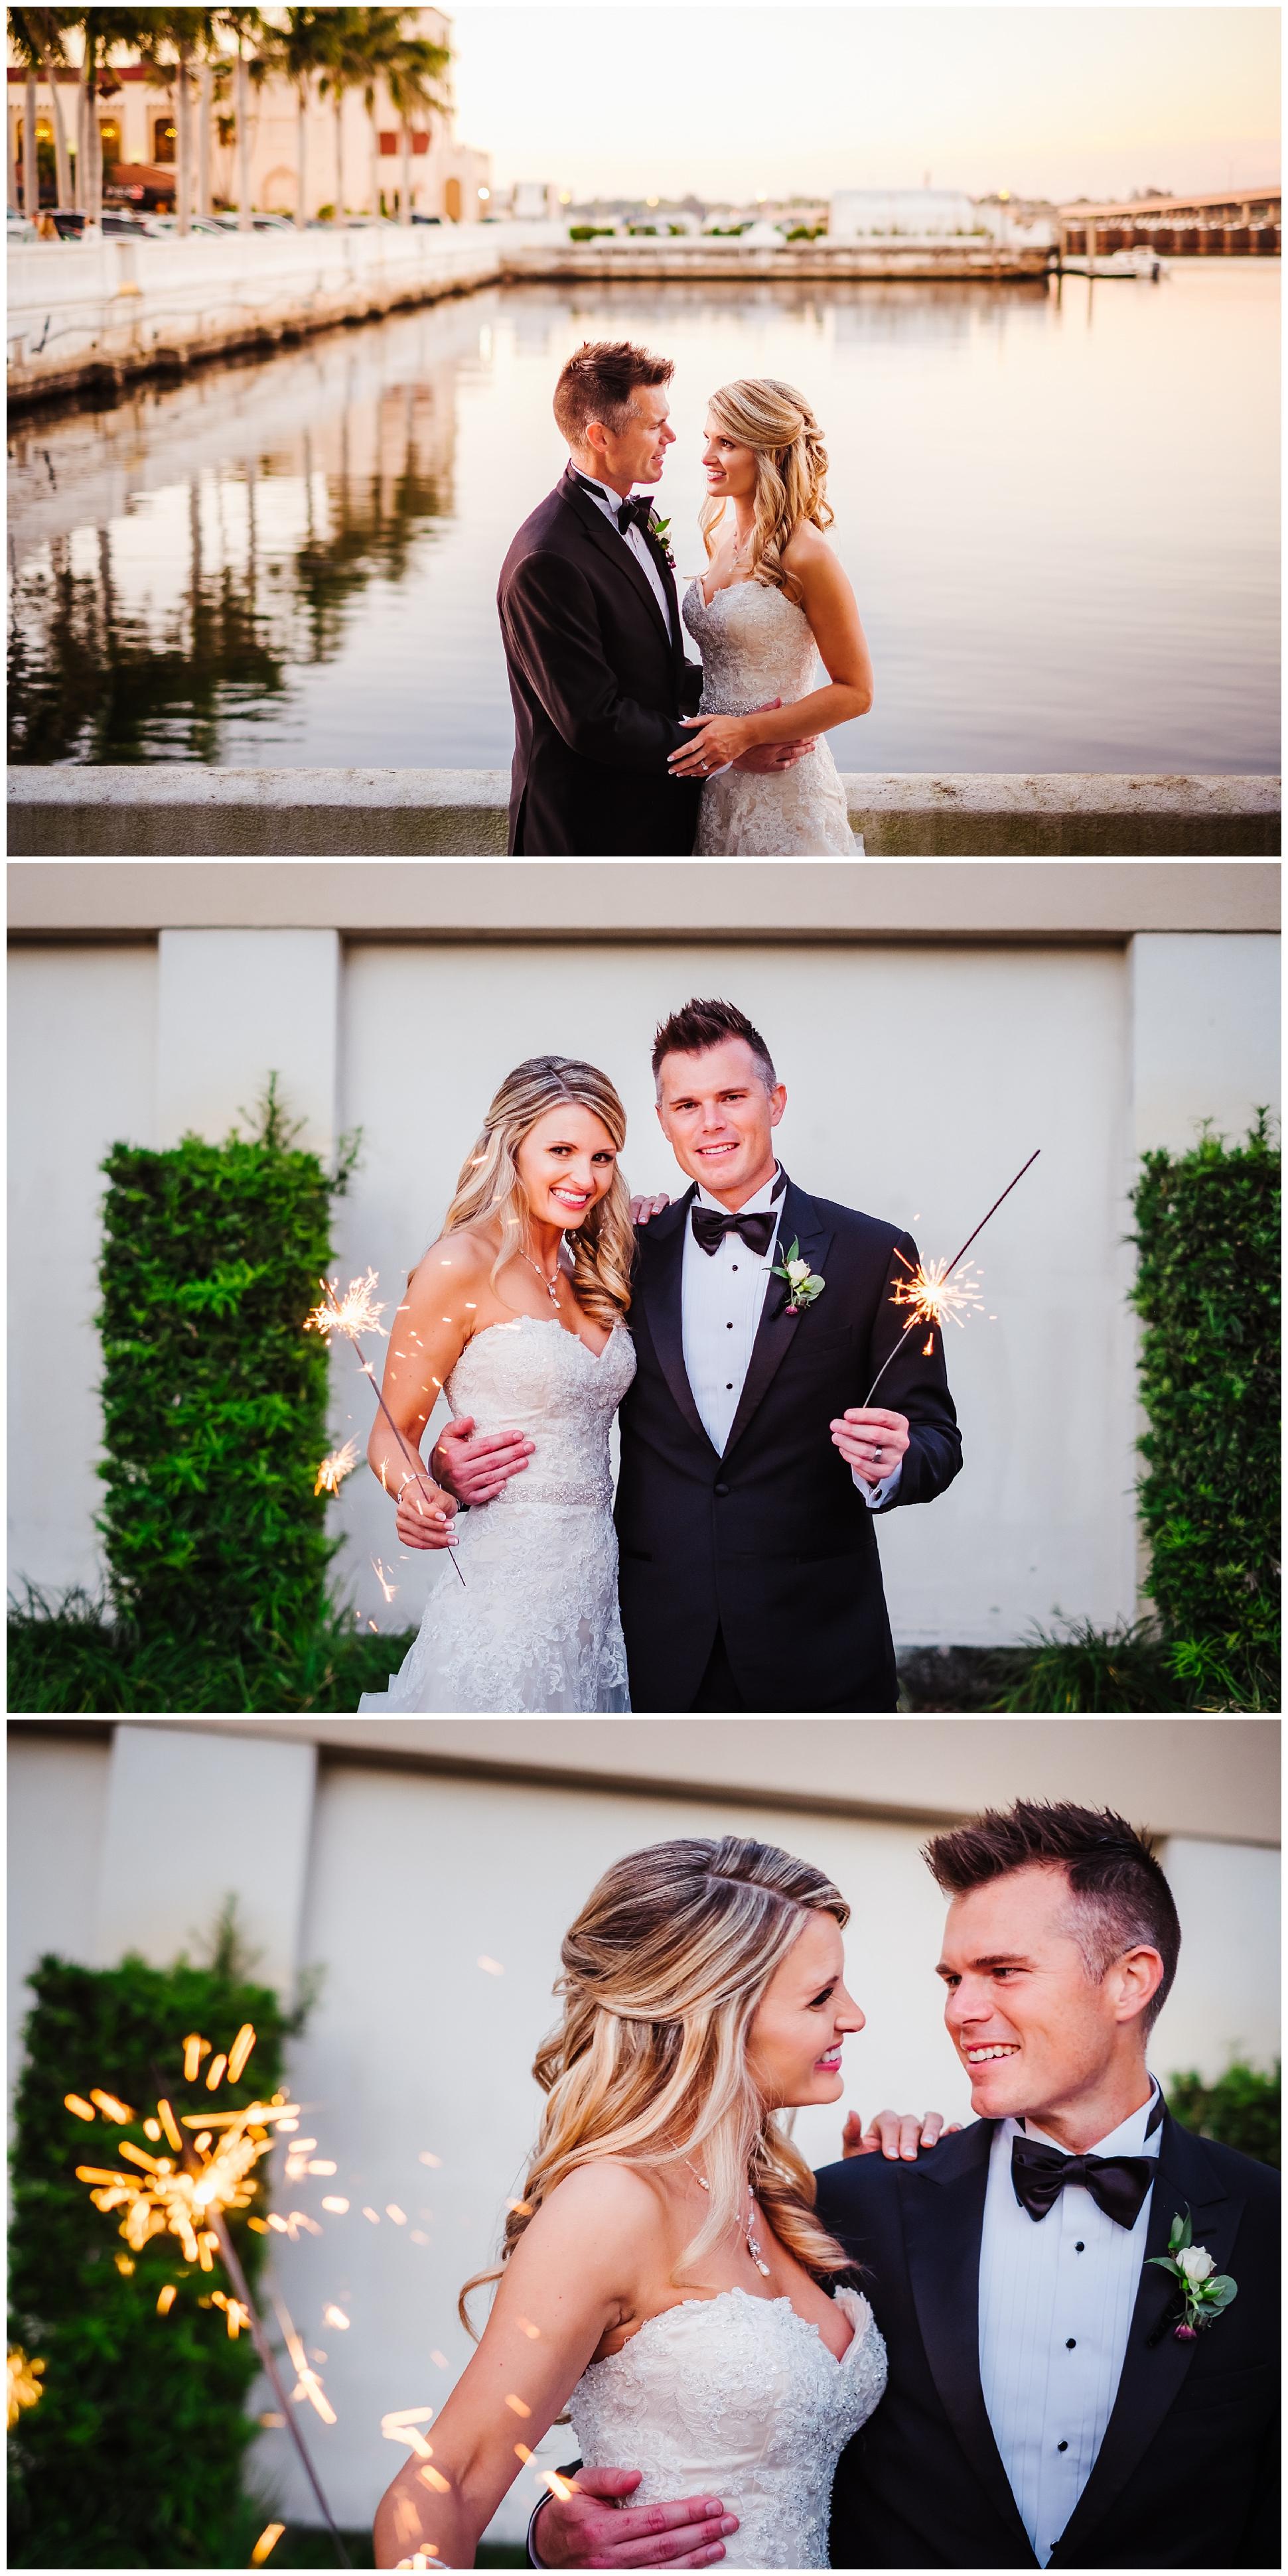 tampa-bradenton-wedding-photographer-south-florida-museum-classic-blush-gold-alpacas-sparklers_0079.jpg